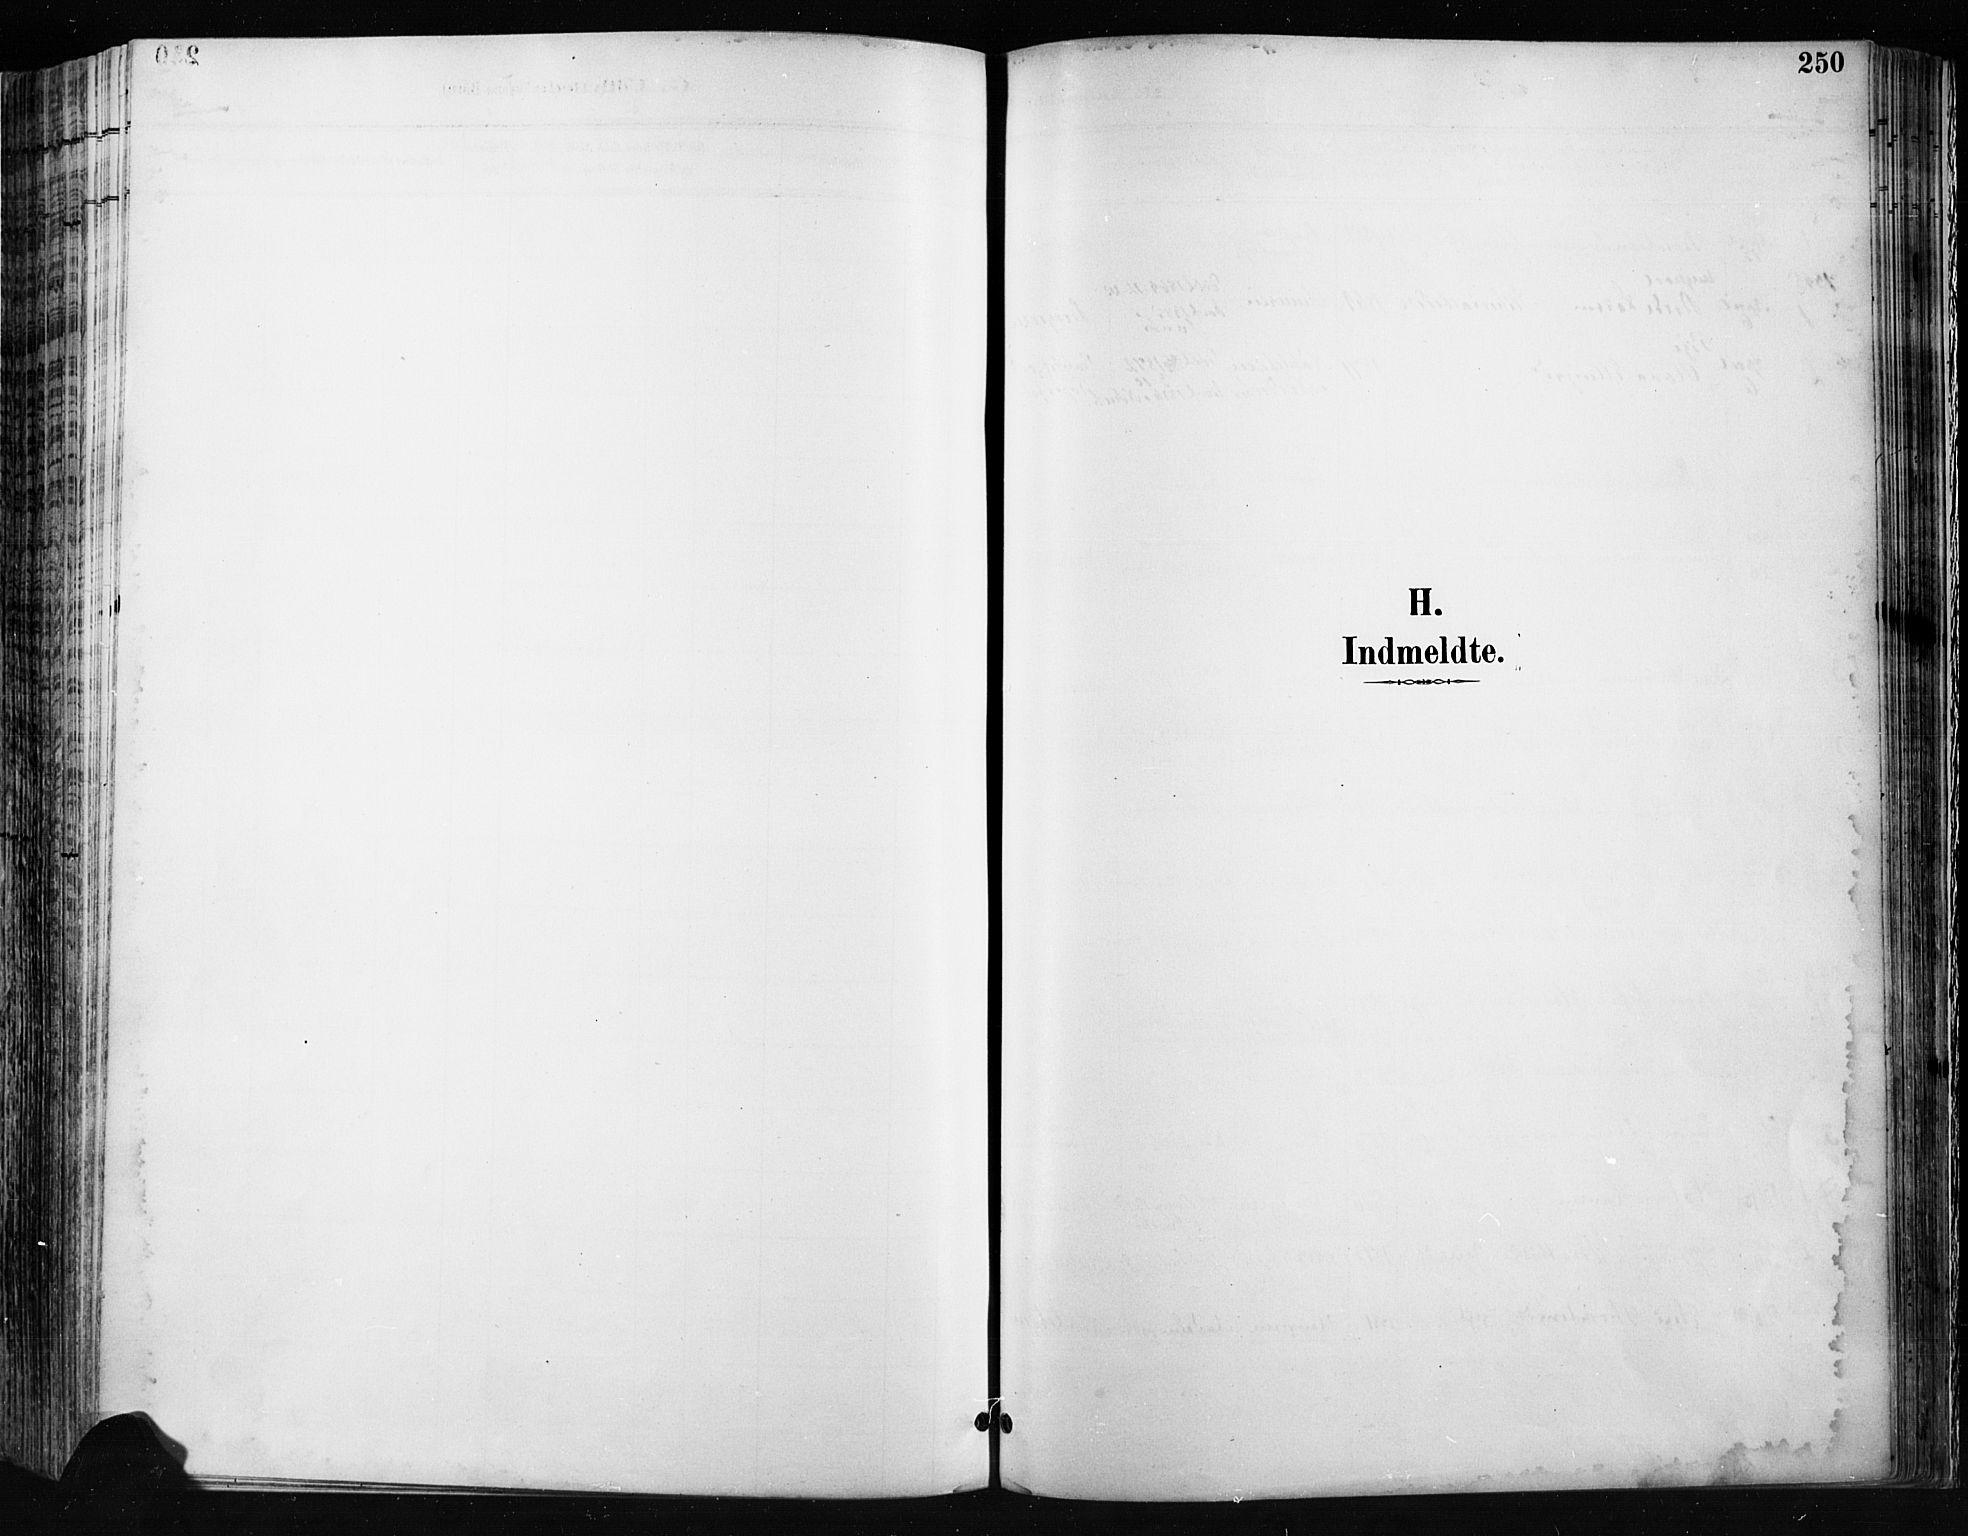 SAH, Jevnaker prestekontor, Ministerialbok nr. 9, 1891-1901, s. 250